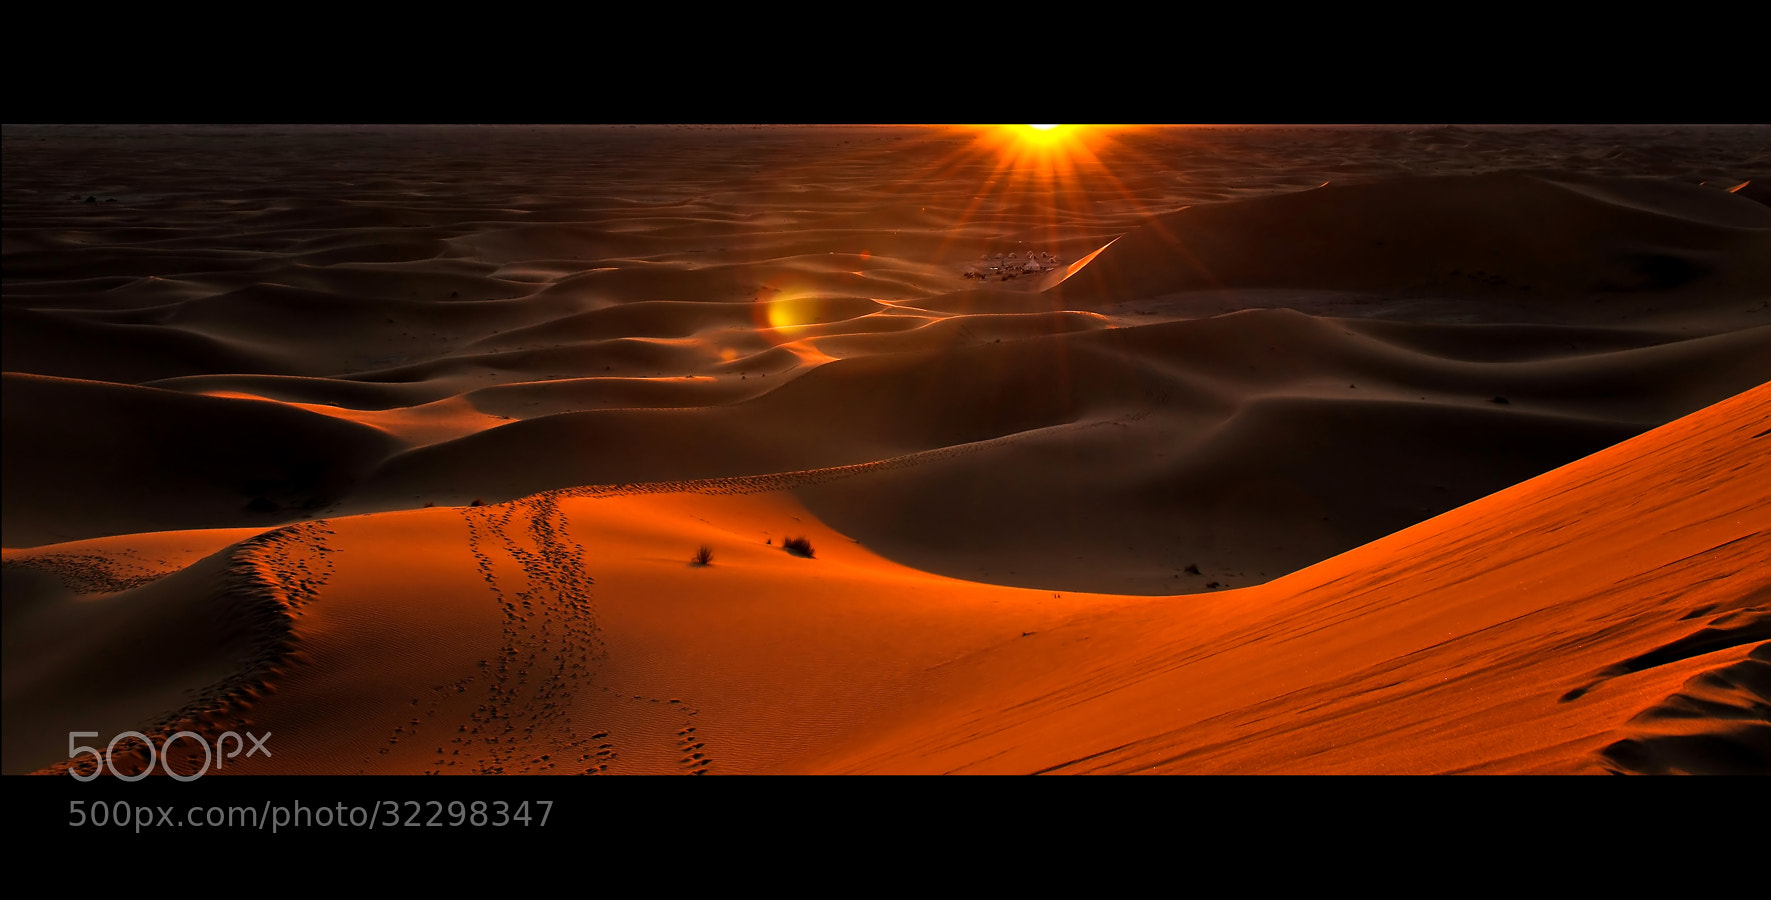 Photograph * Sahara sunrise * by clement jousse on 500px